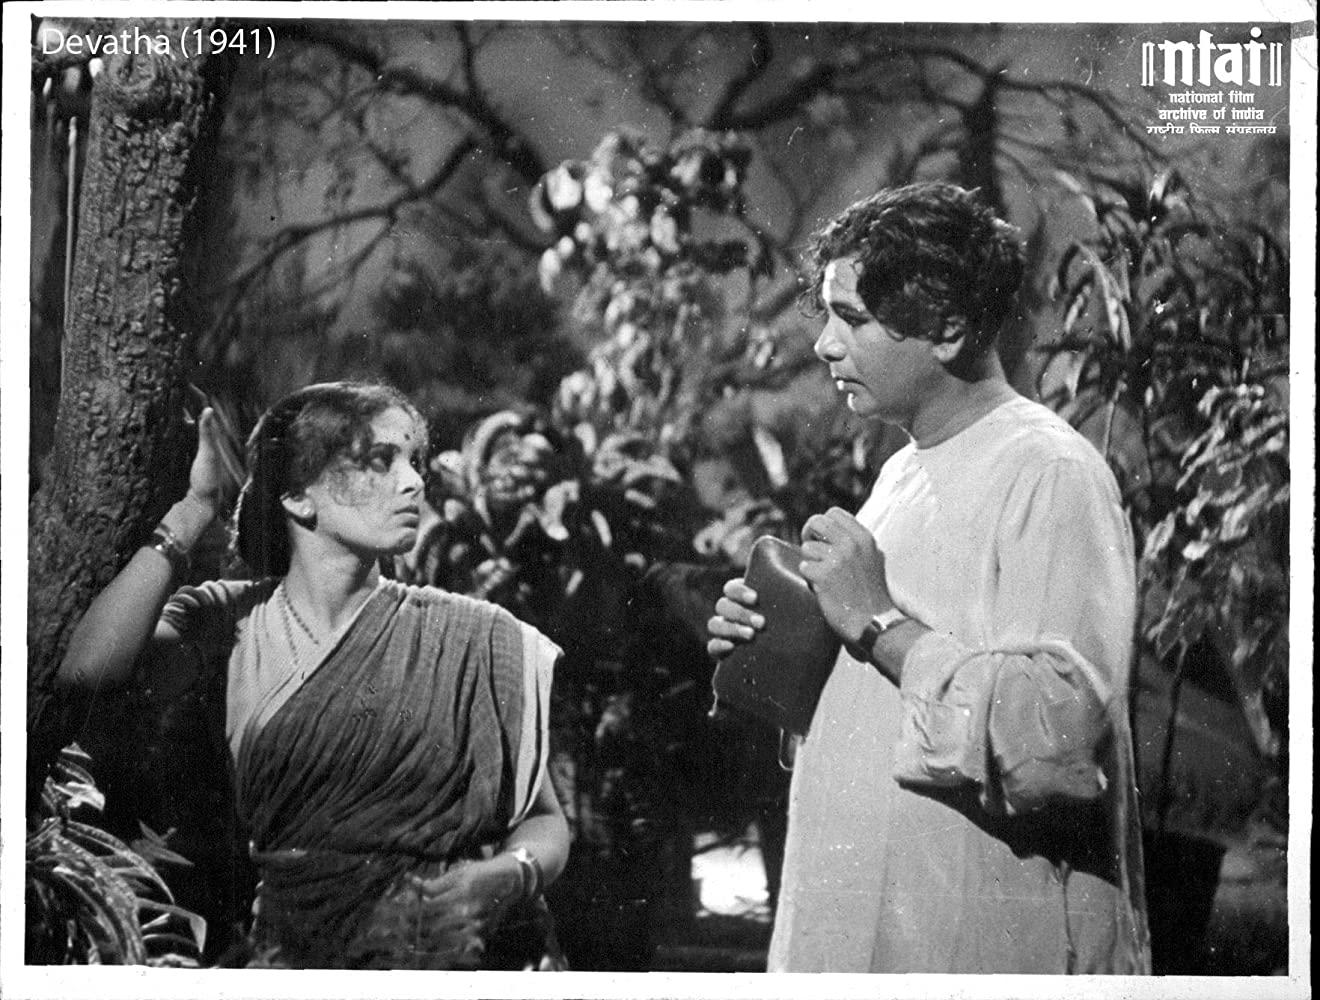 Devata (1941): The Outstanding Drama with Powerful Title #TeluguCinemaHistory